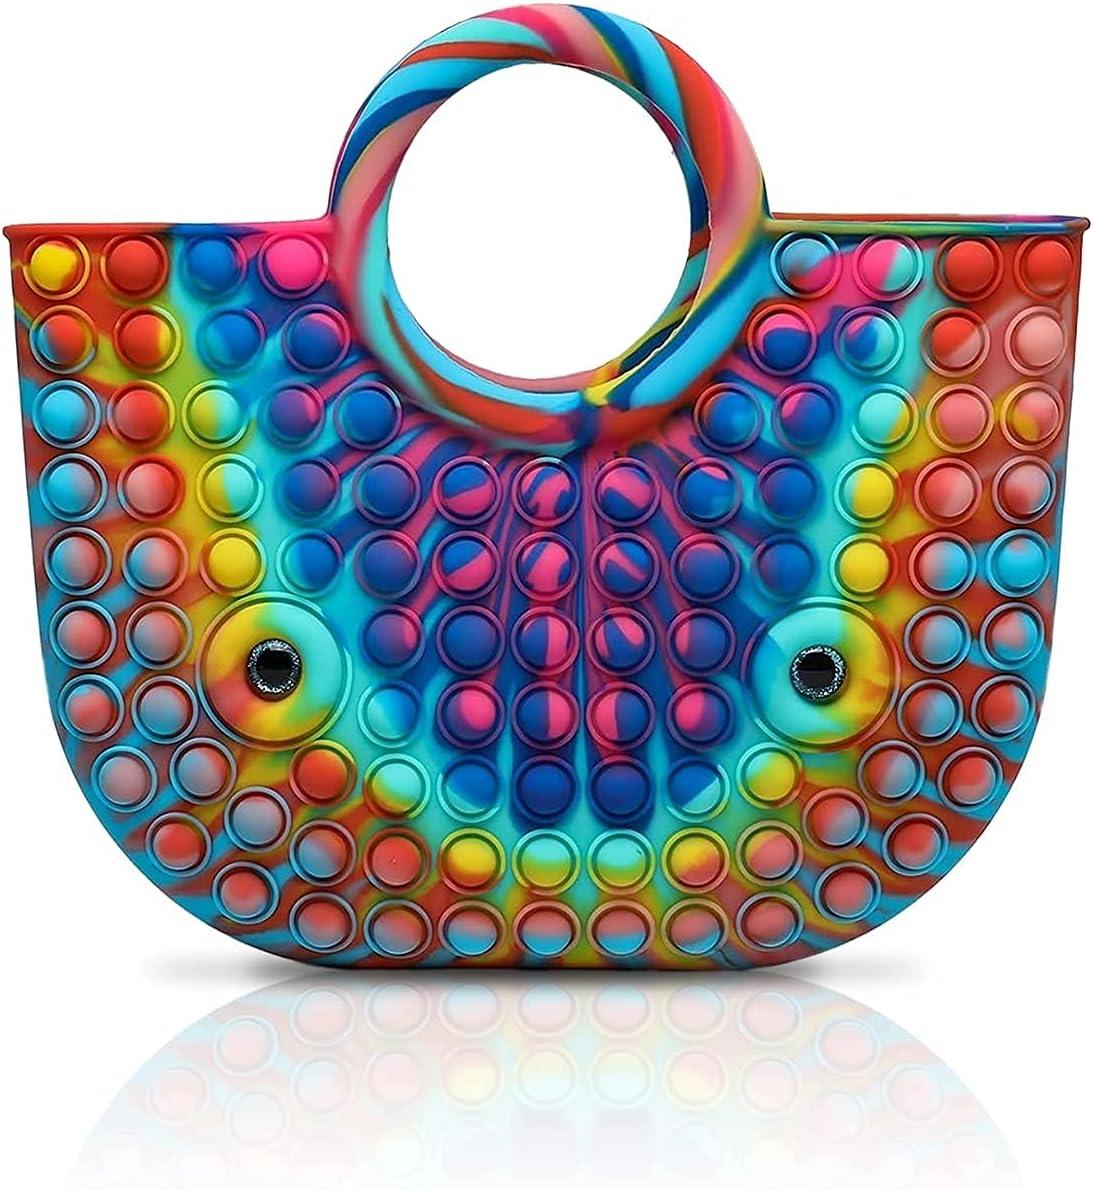 Max 50% OFF 9 Colors Fidget Sensory Popper Silico Max 61% OFF Ladies Handbags for Women